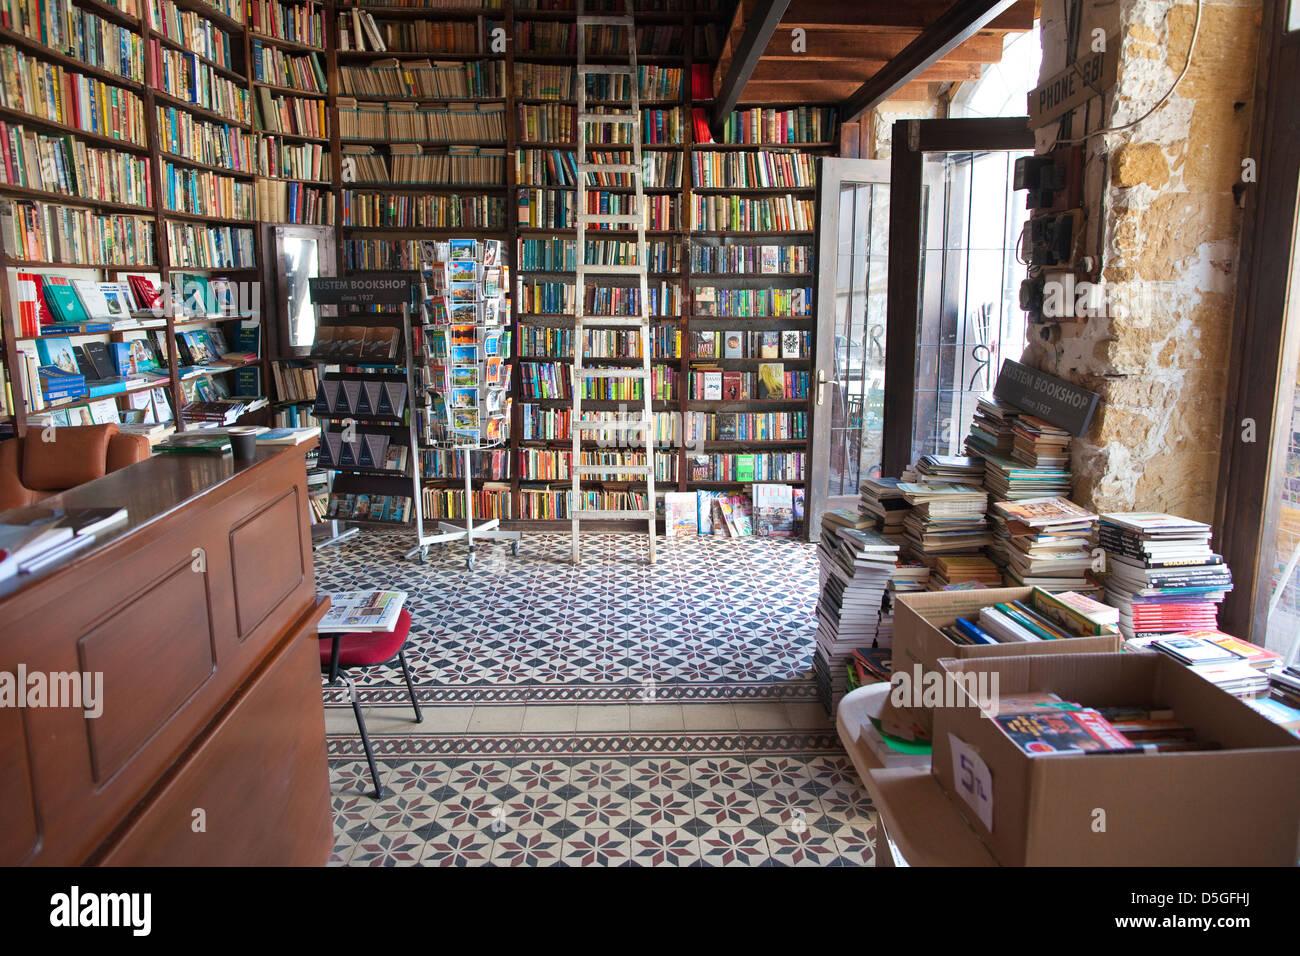 Rüstem Kitabevi bookstore in Nicosia North, Cyprus - Stock Image